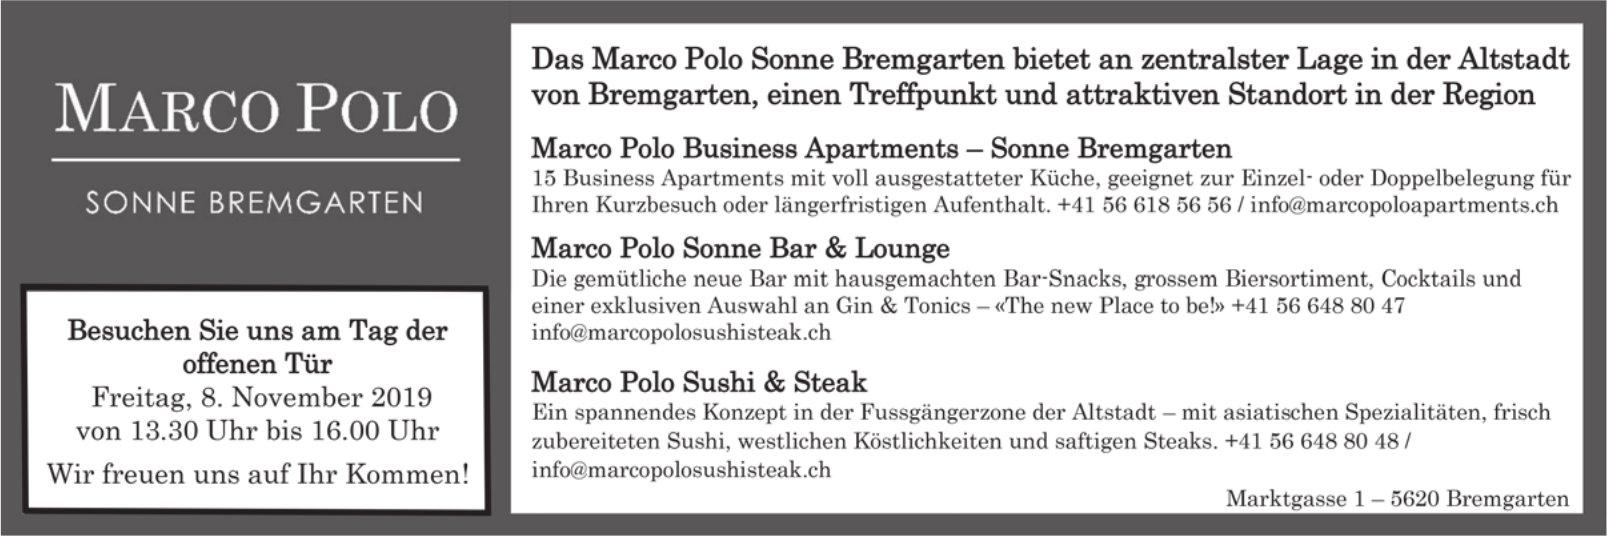 Marco Polo Sonne Bremgarten